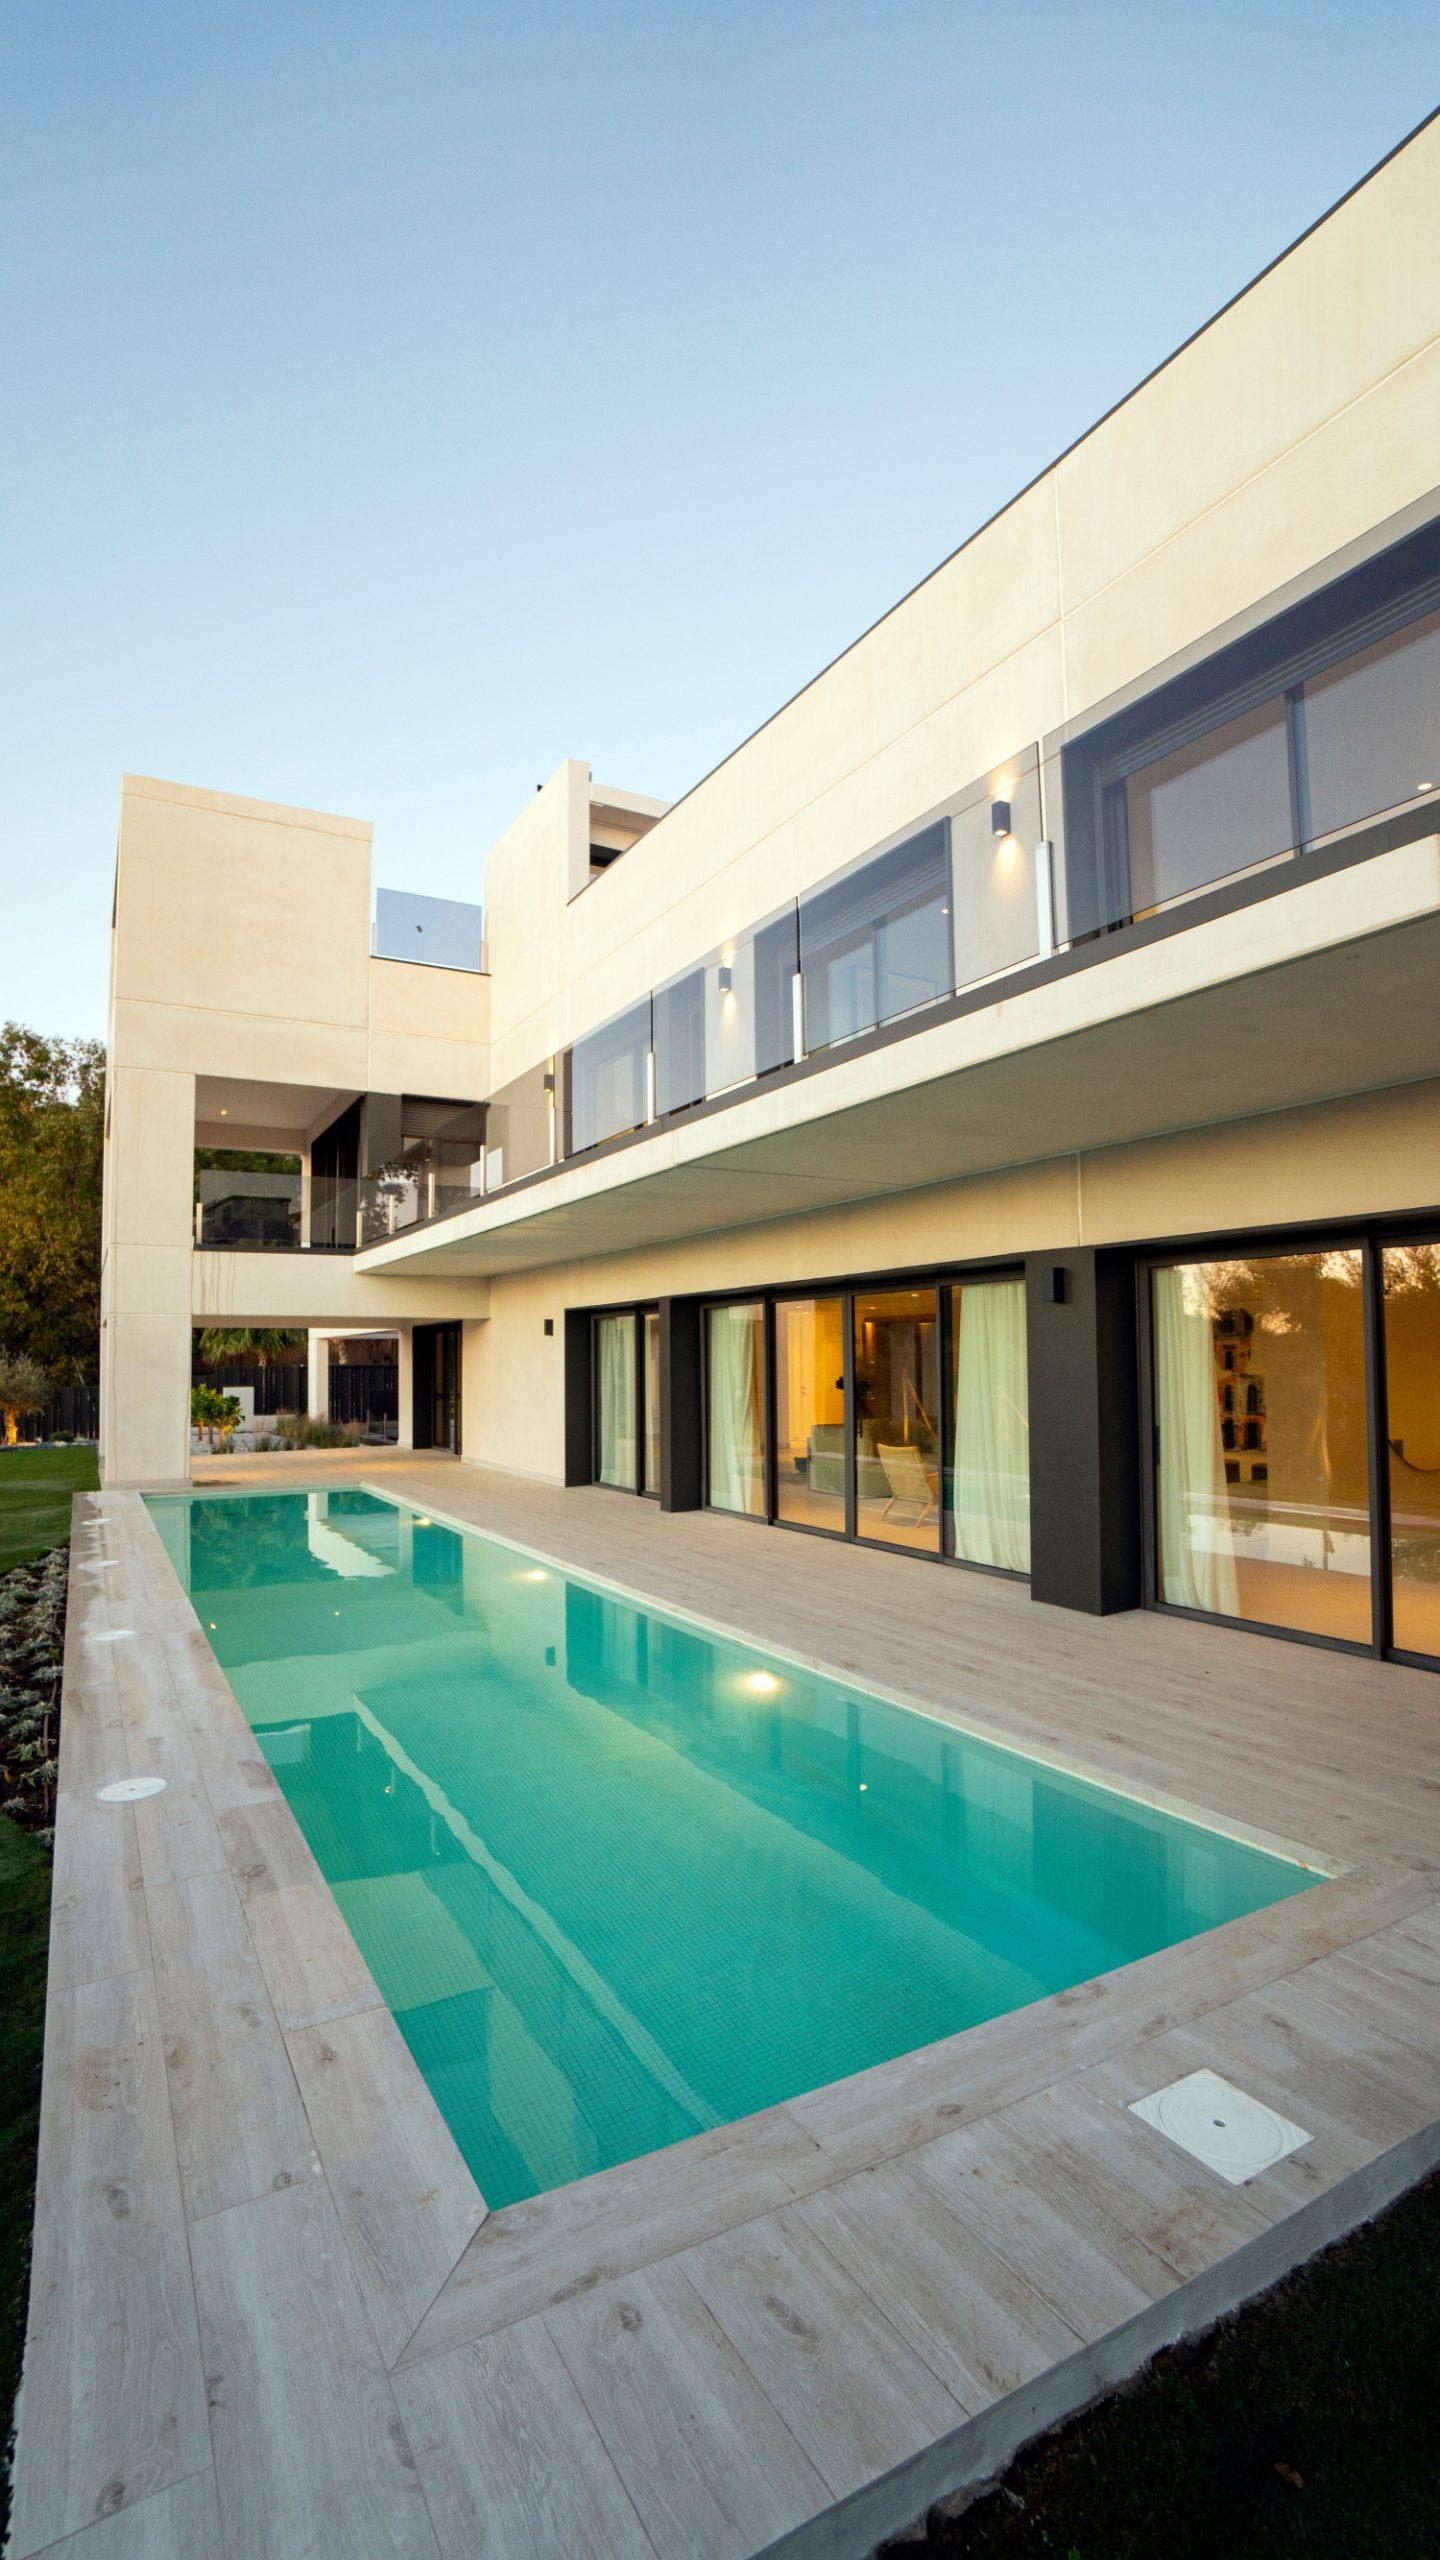 Villa for sale in Benalmádena Pueblo, Benalmádena, Málaga, Spain